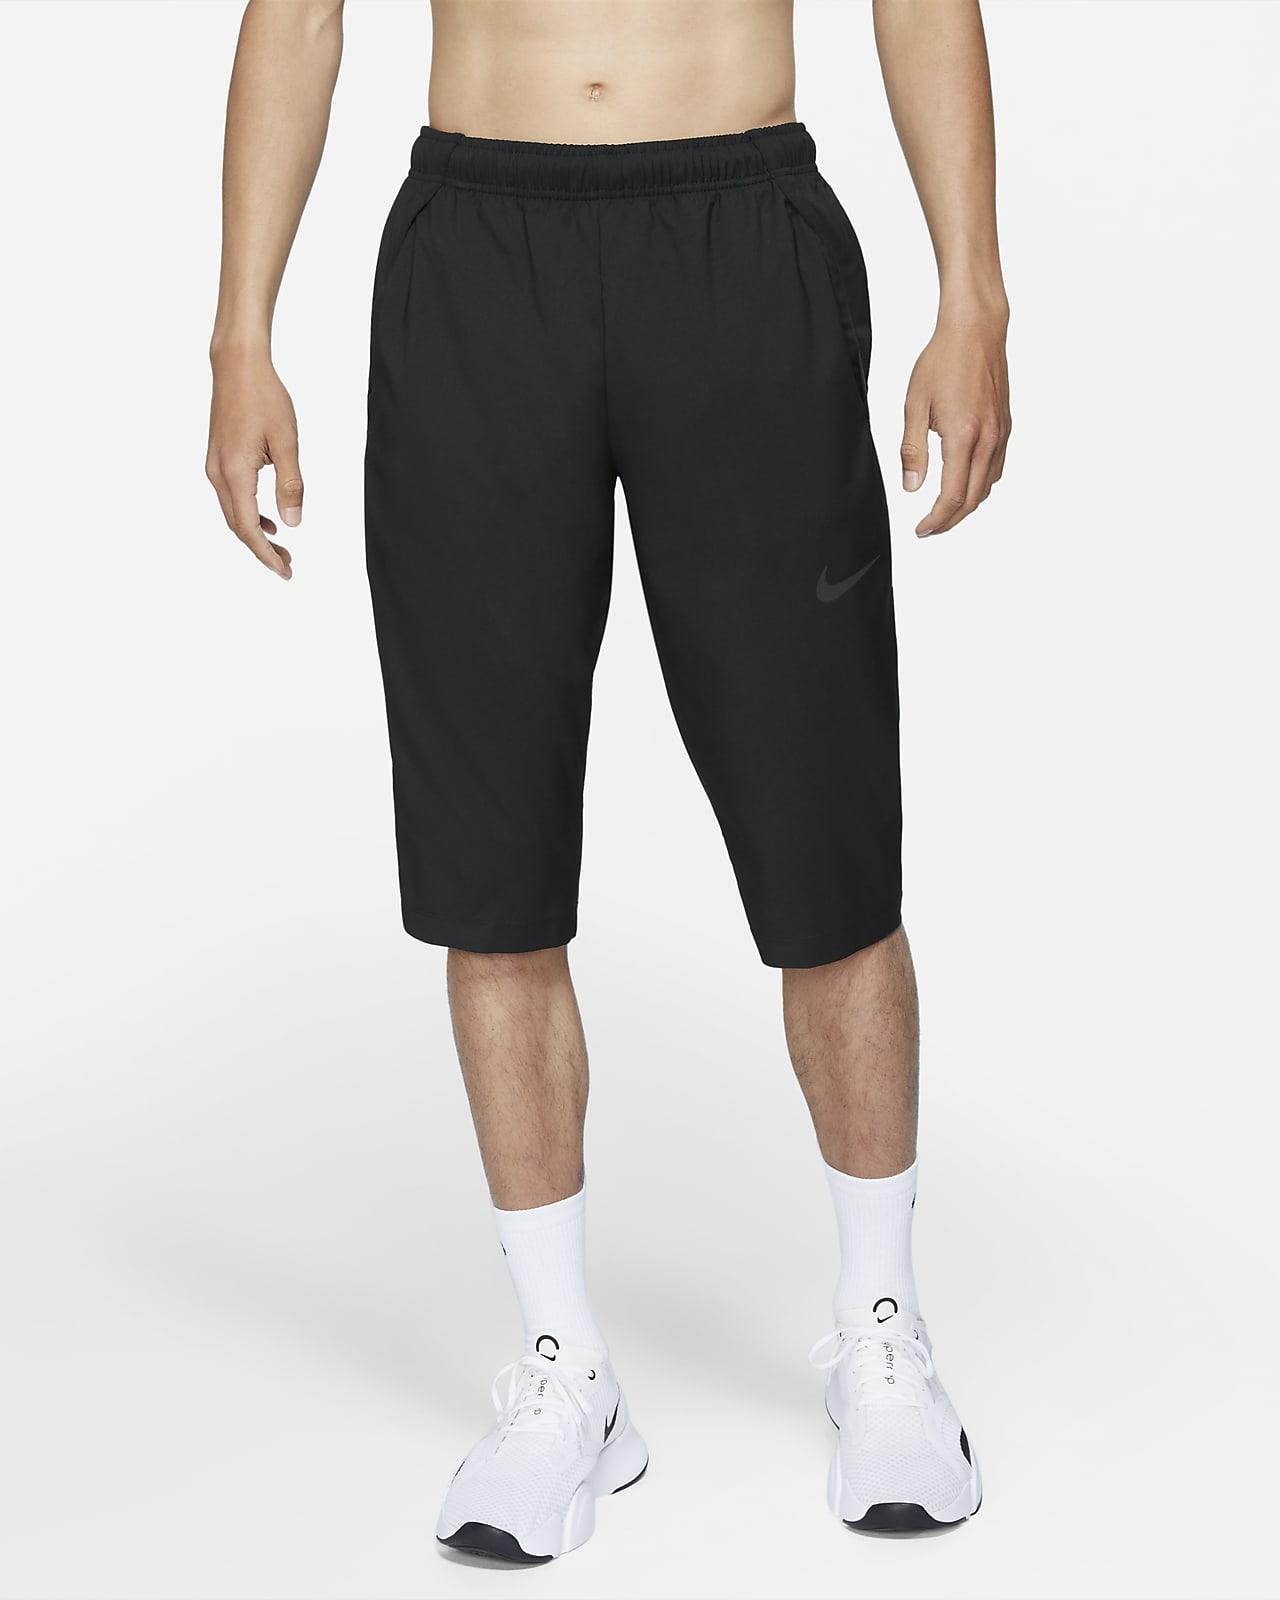 Nike Team 3/4 男子梭织训练裤